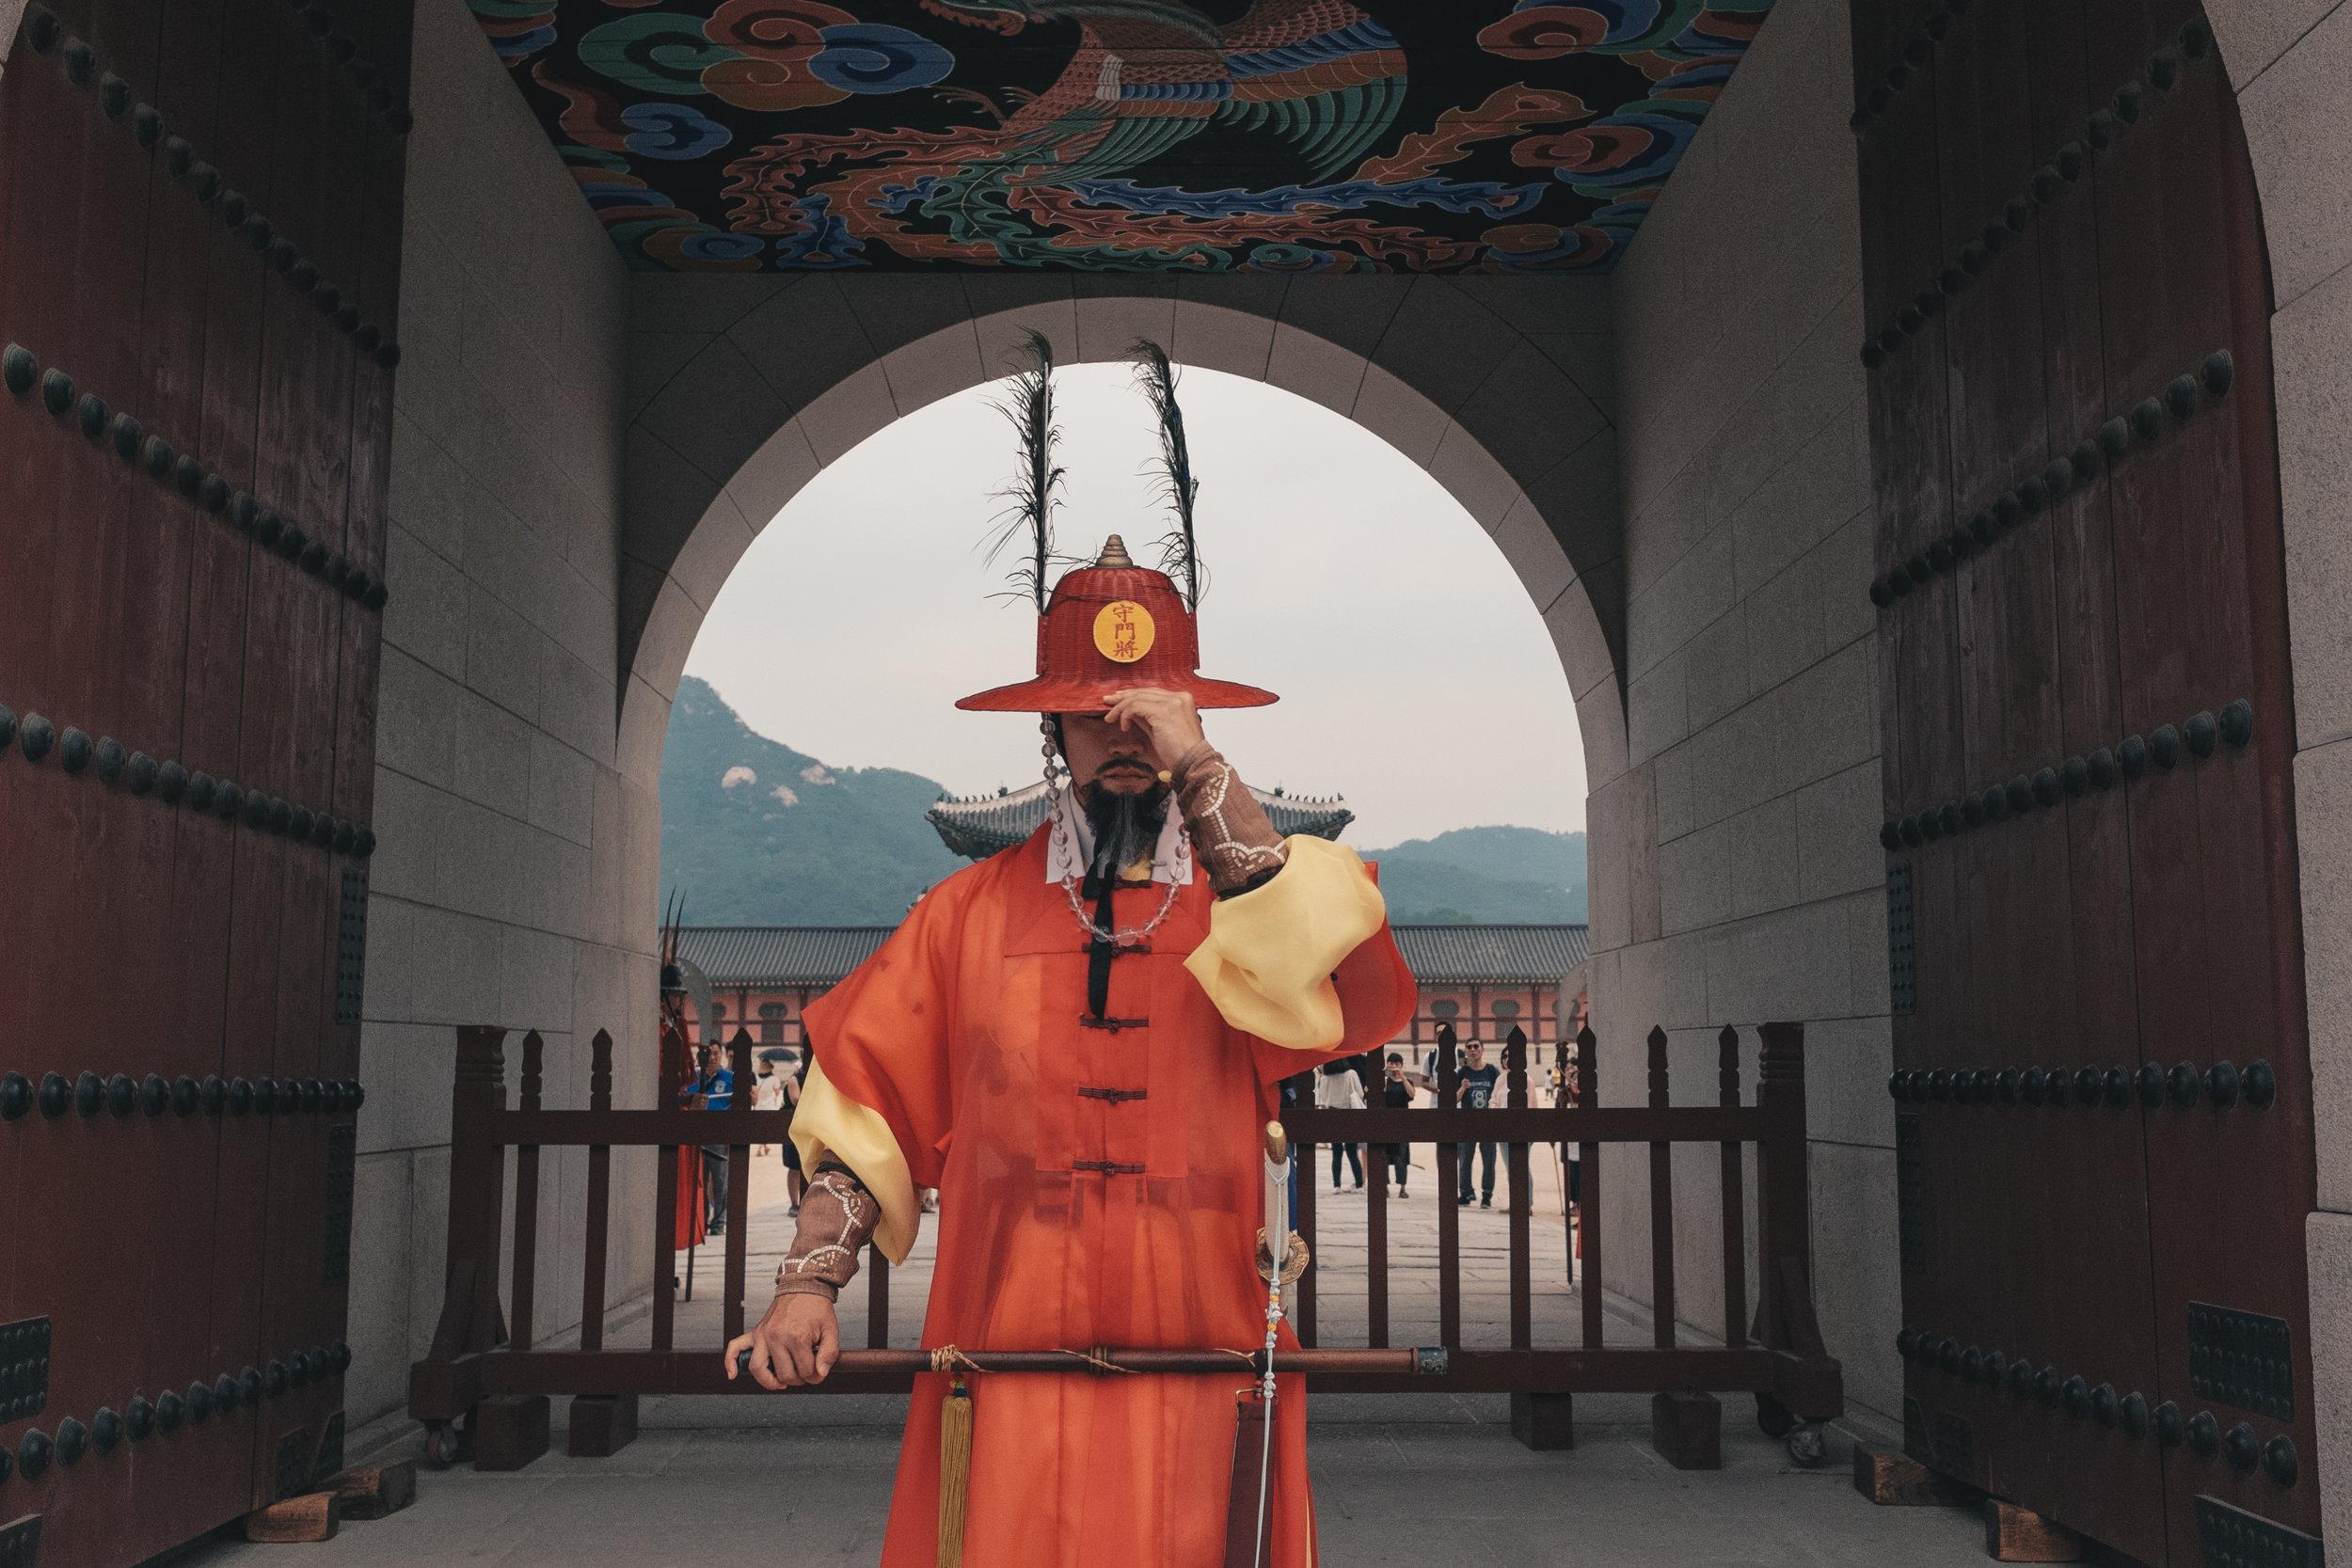 A royal guard posing for a picture at Seoul's Gyeongbukgung Palace